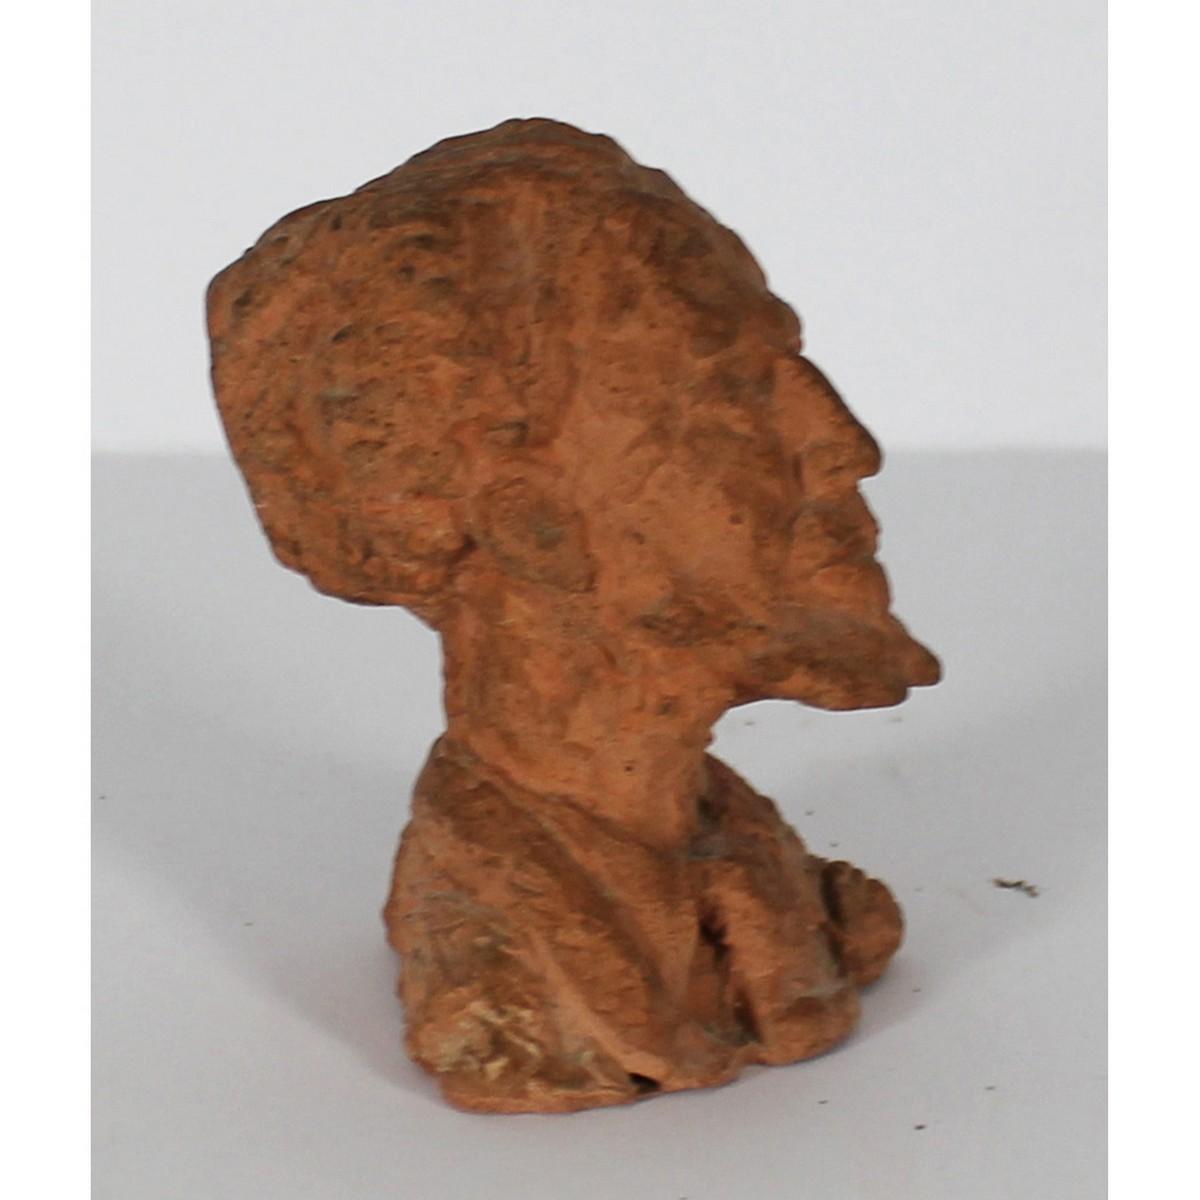 Lot 17 - Oloff de Wet, Hugh 1912-1975 British, Ezra Pound.